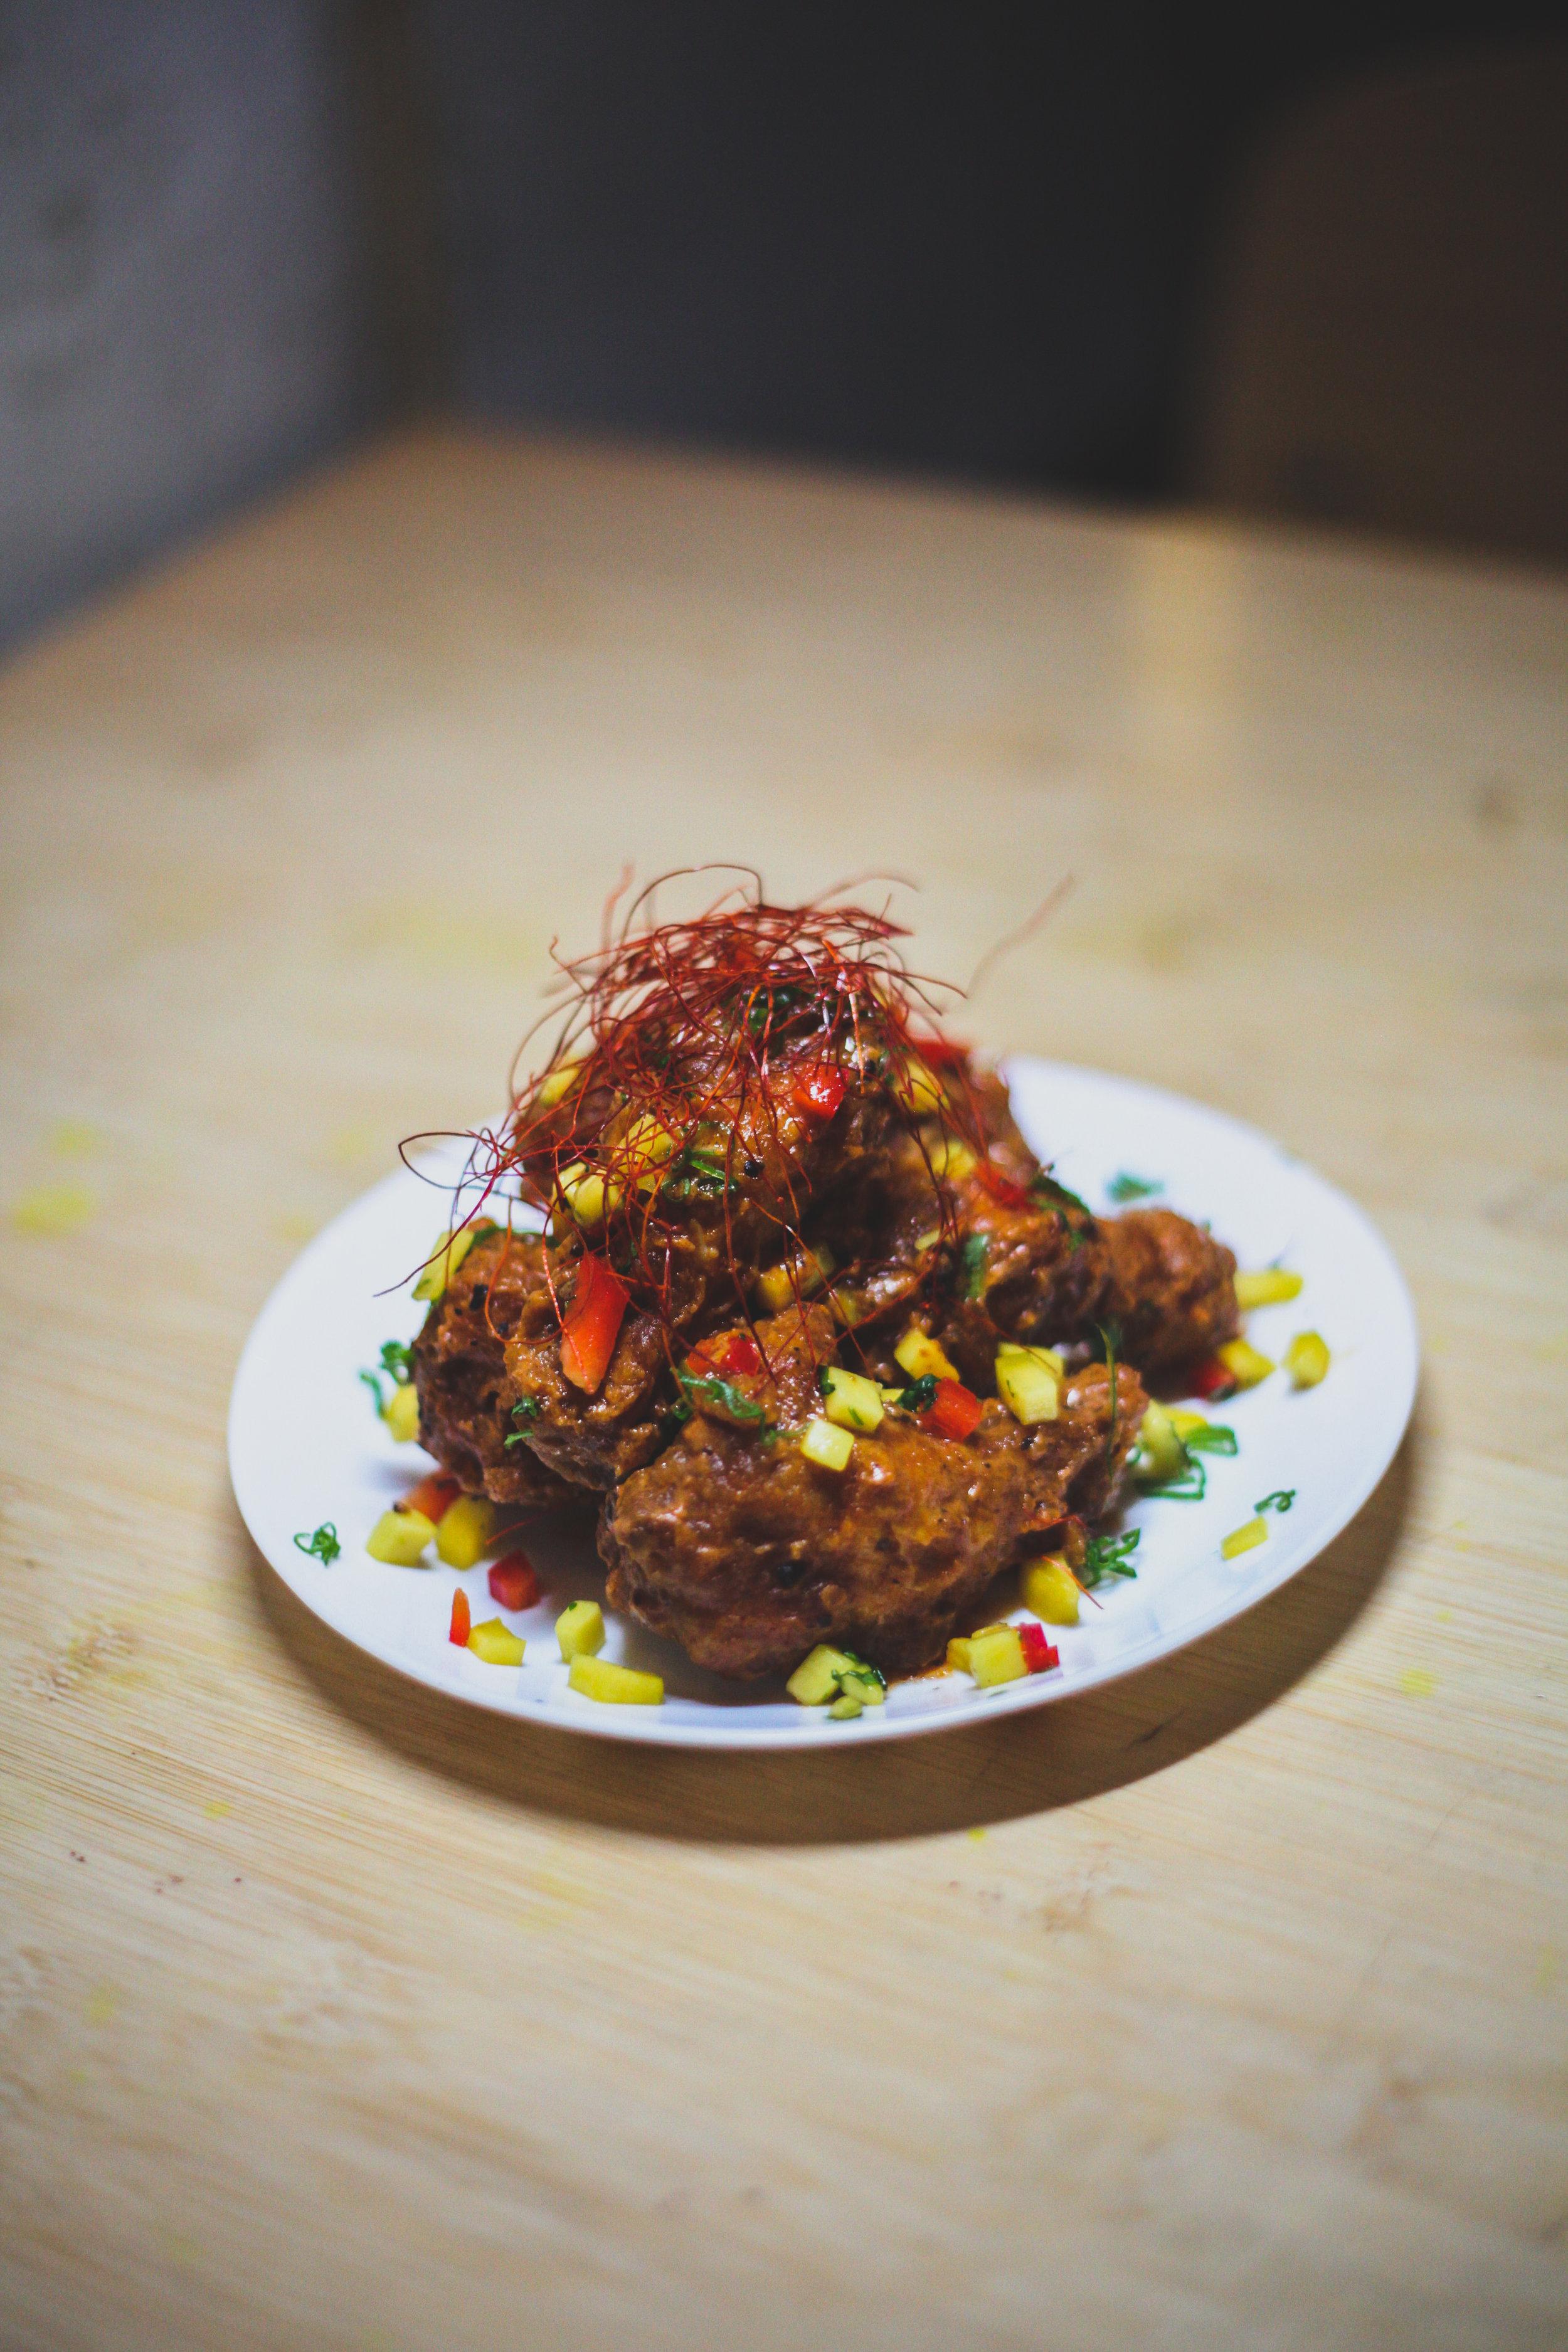 chicken_wings_bintang_restaurant_camden_london.jpg